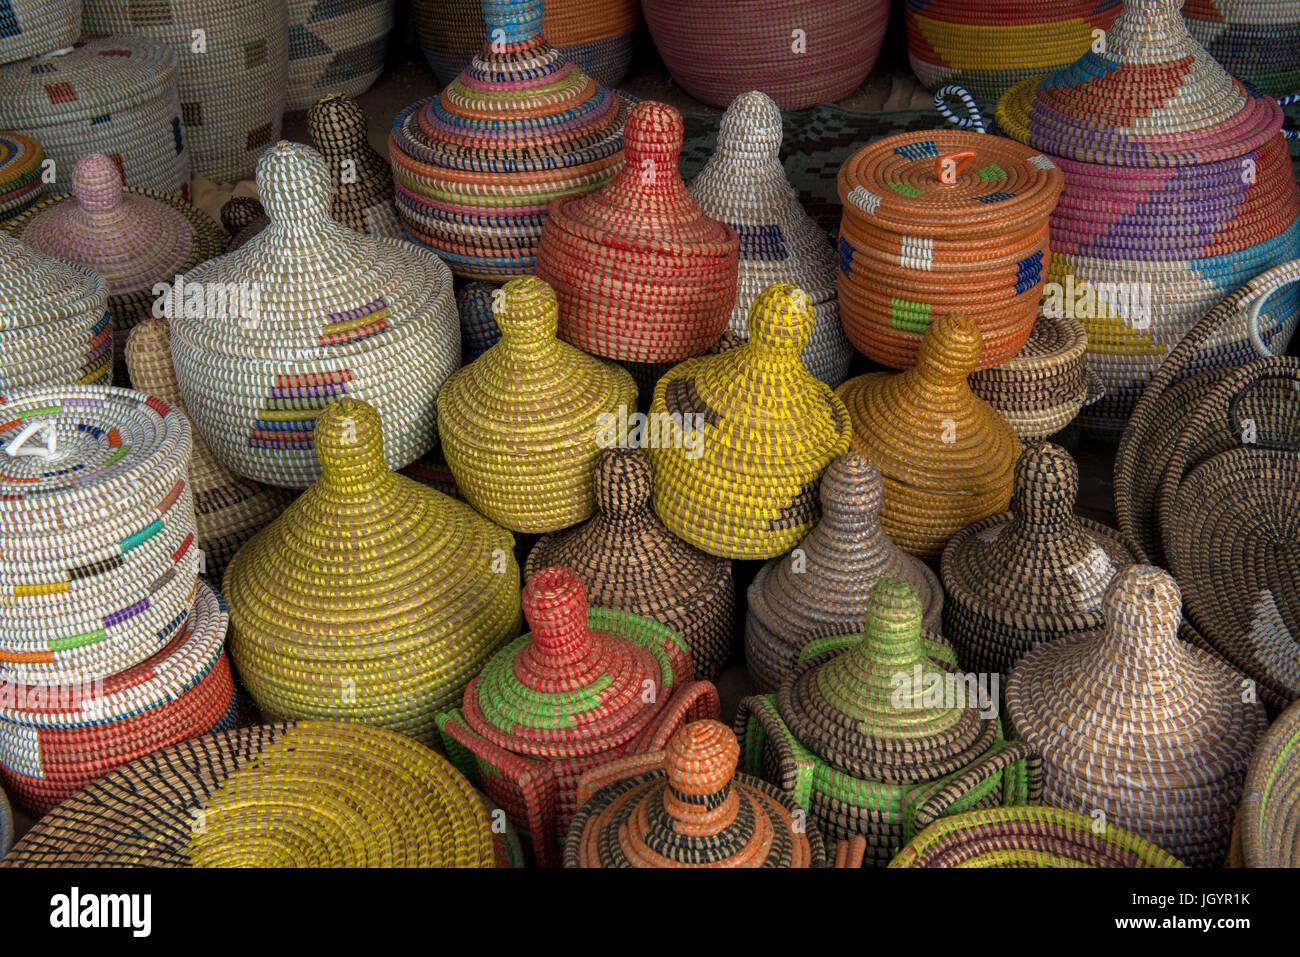 Handmade basket shop. Senegal. - Stock Image